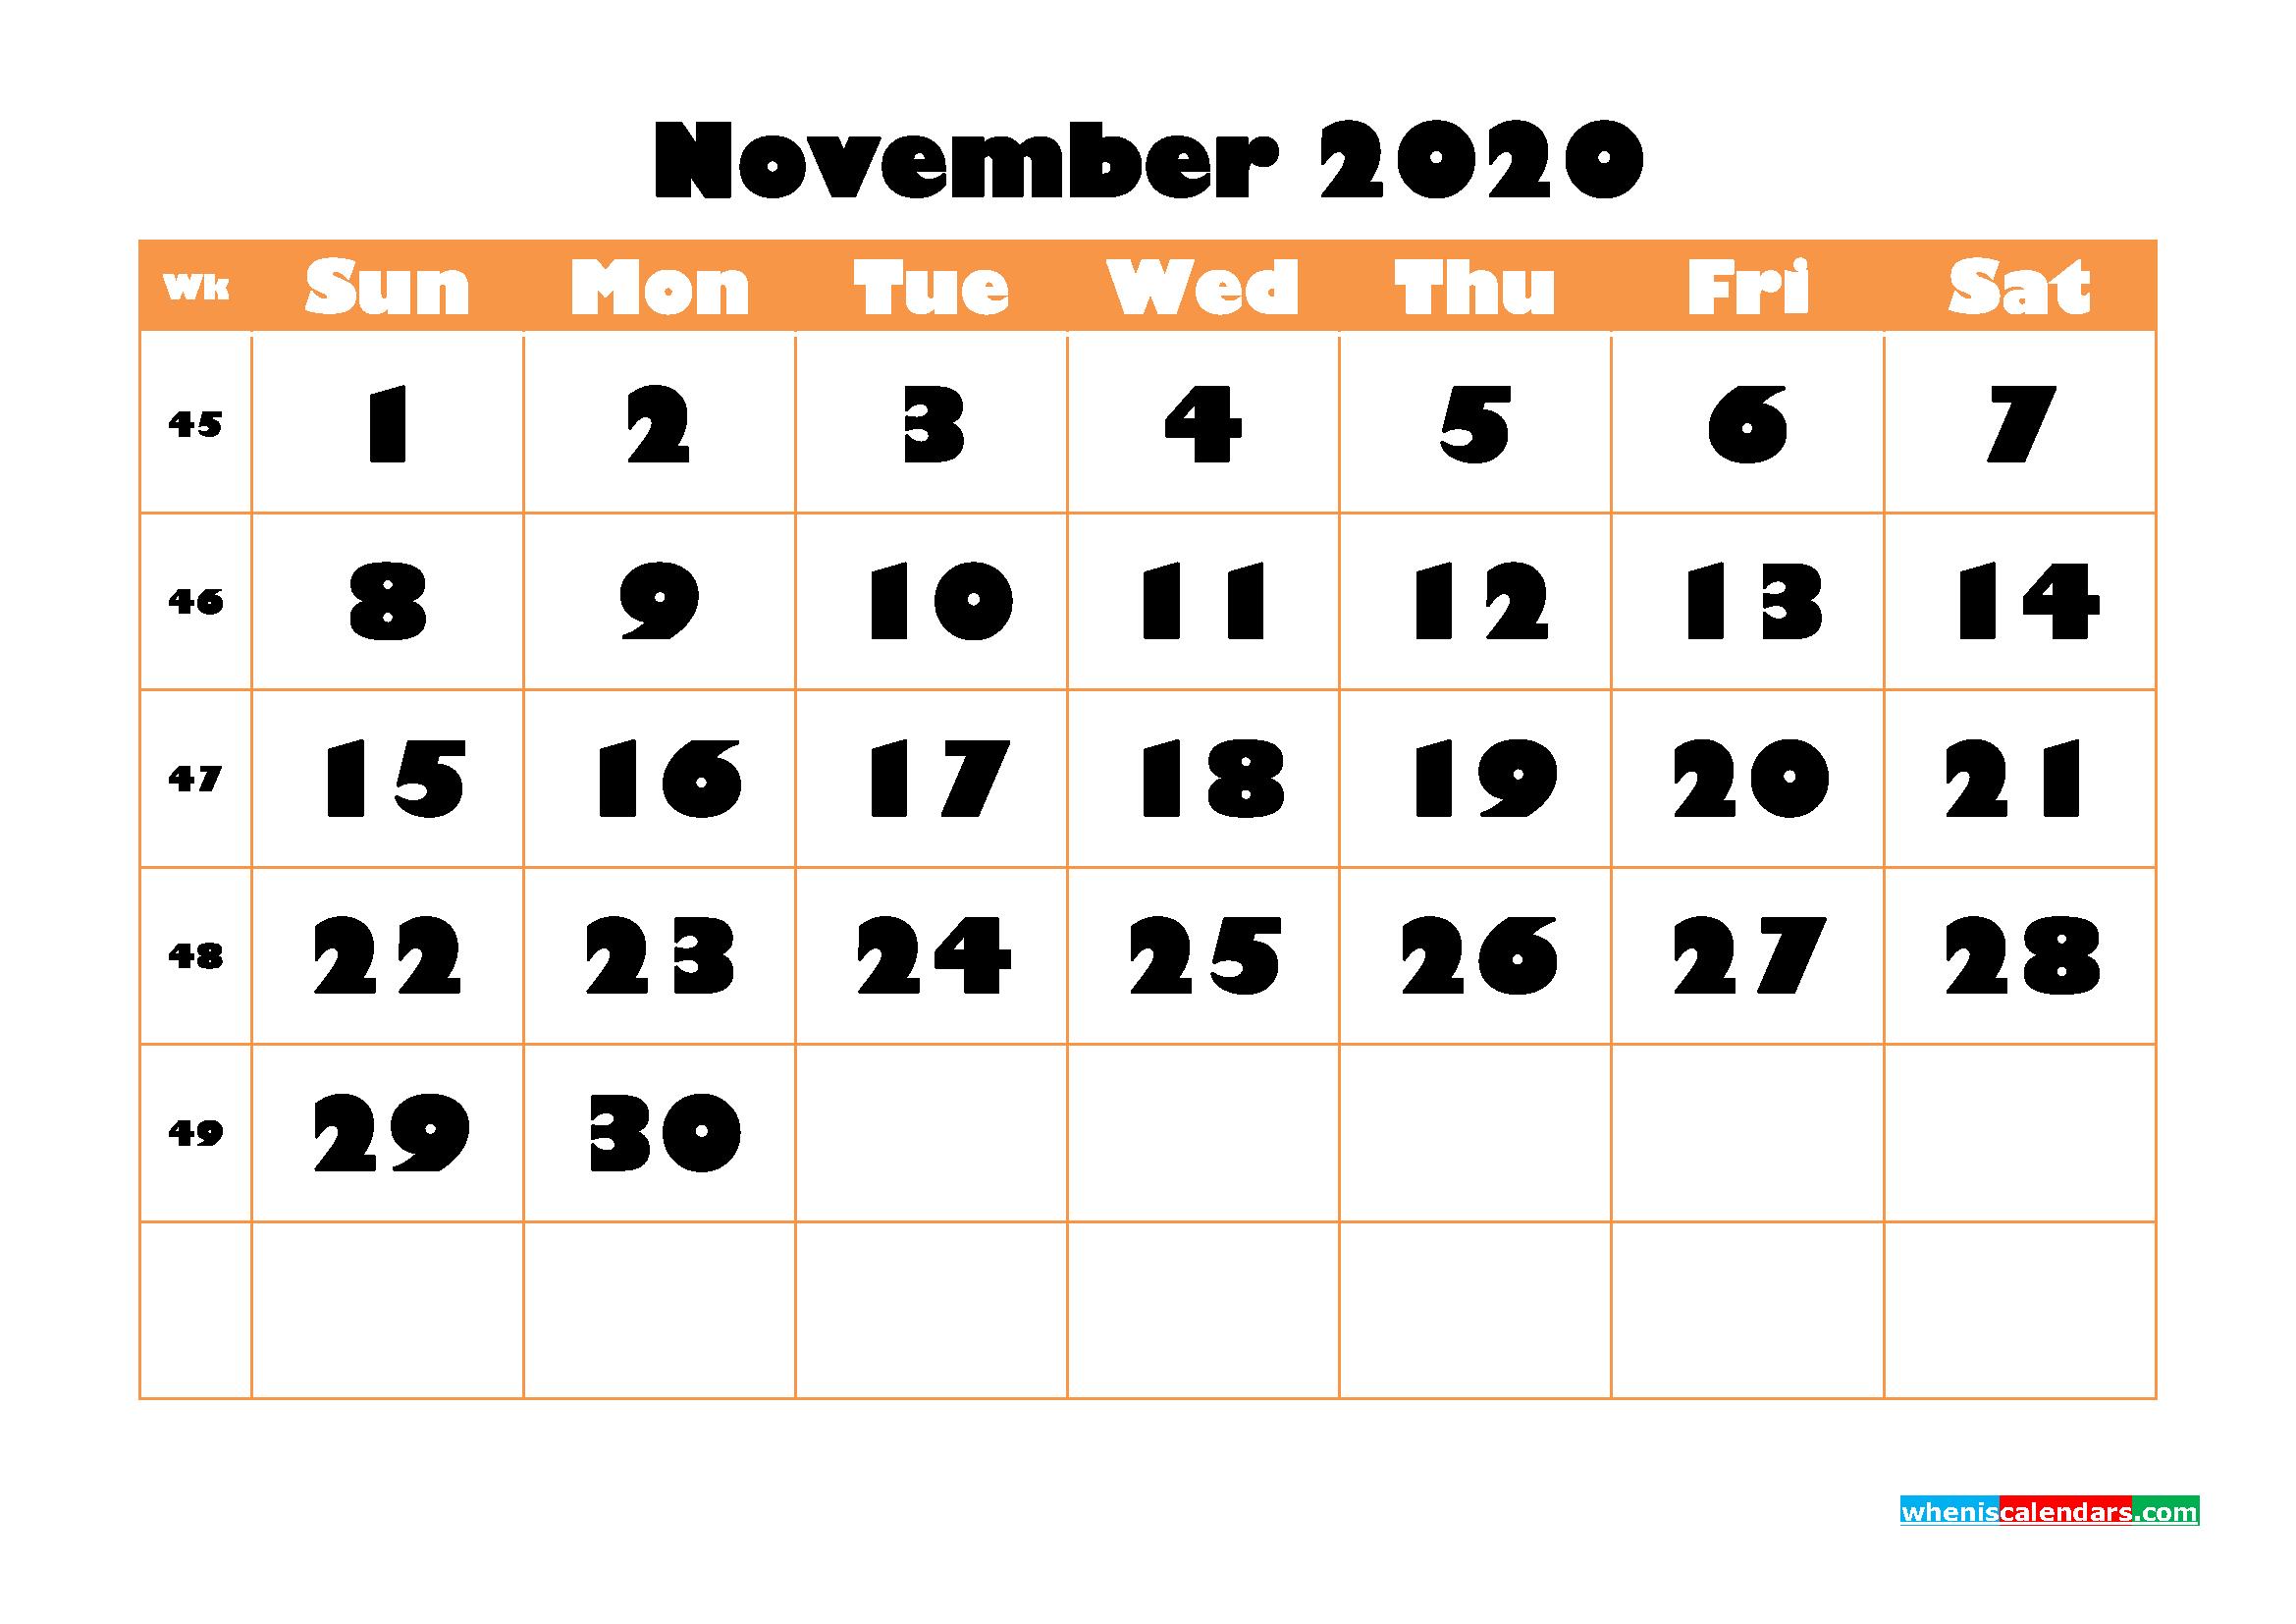 Blank November 2020 Calendar Printable - No.m20b779